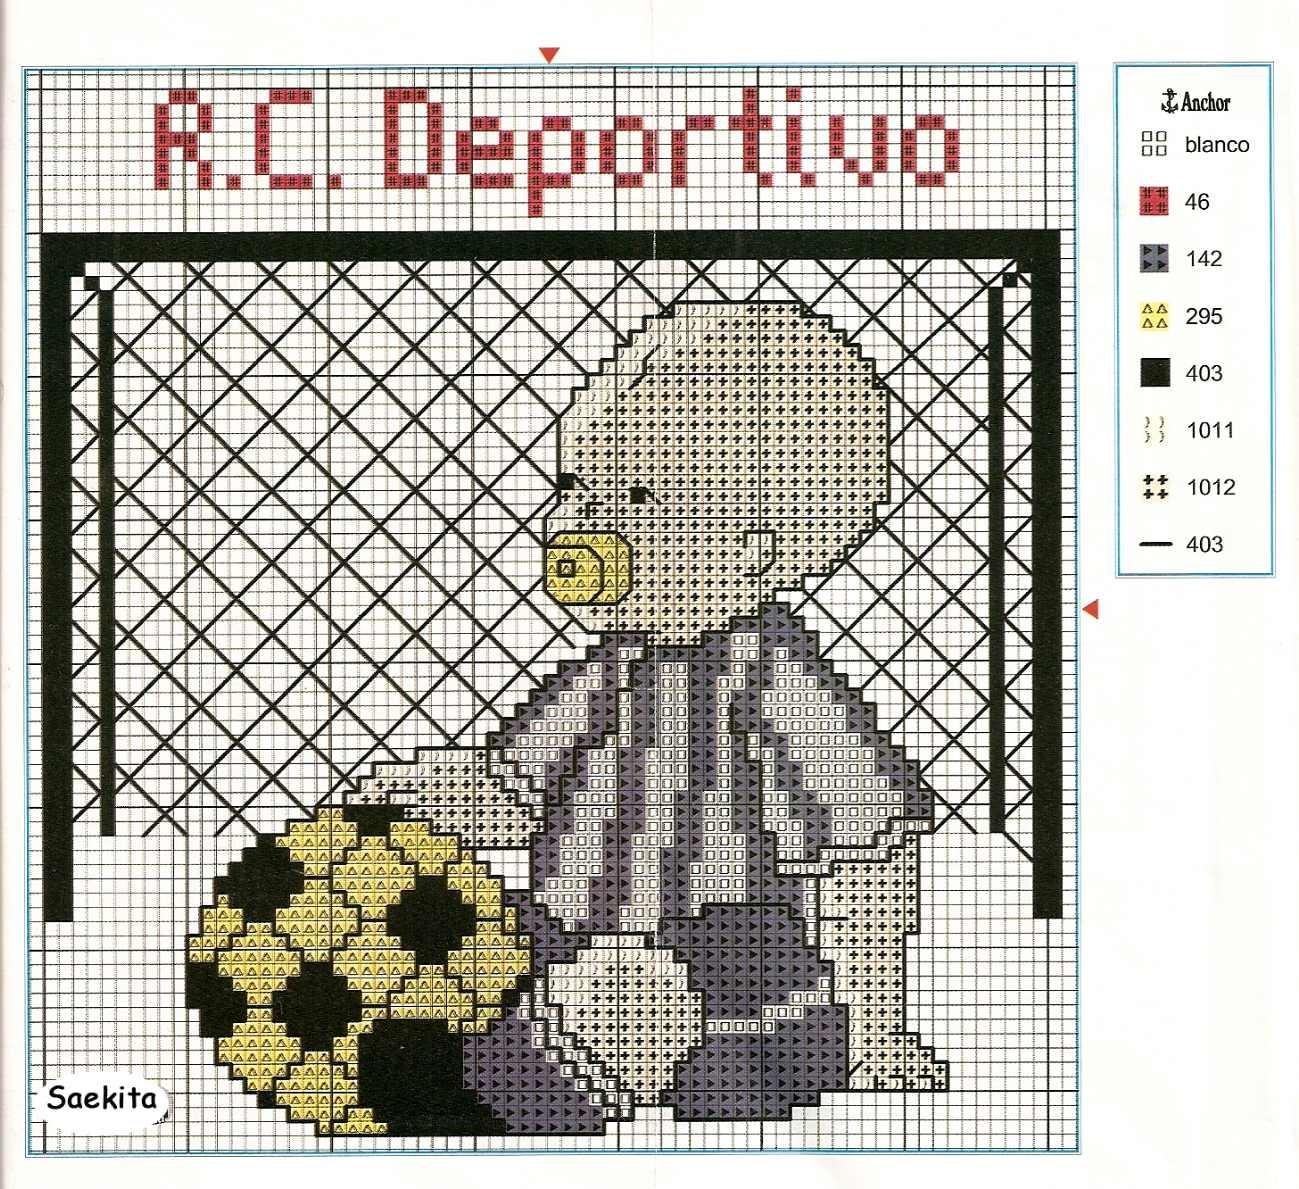 [qqR+C+Deportivo%5B2%5D]